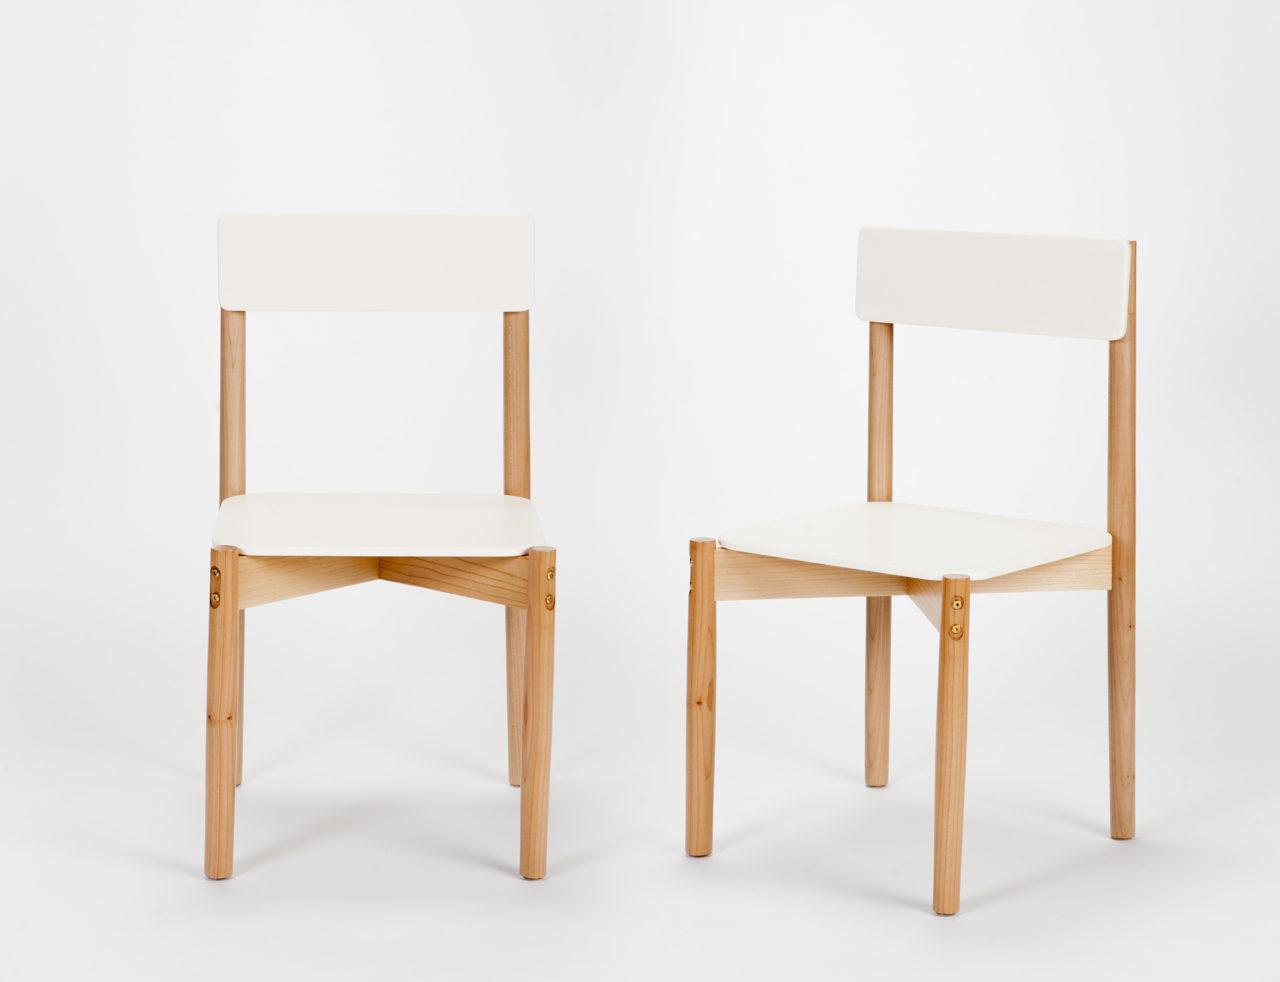 Generación DECODE 2016: Corian Flat Pack Chair por Eduardo Altamirano